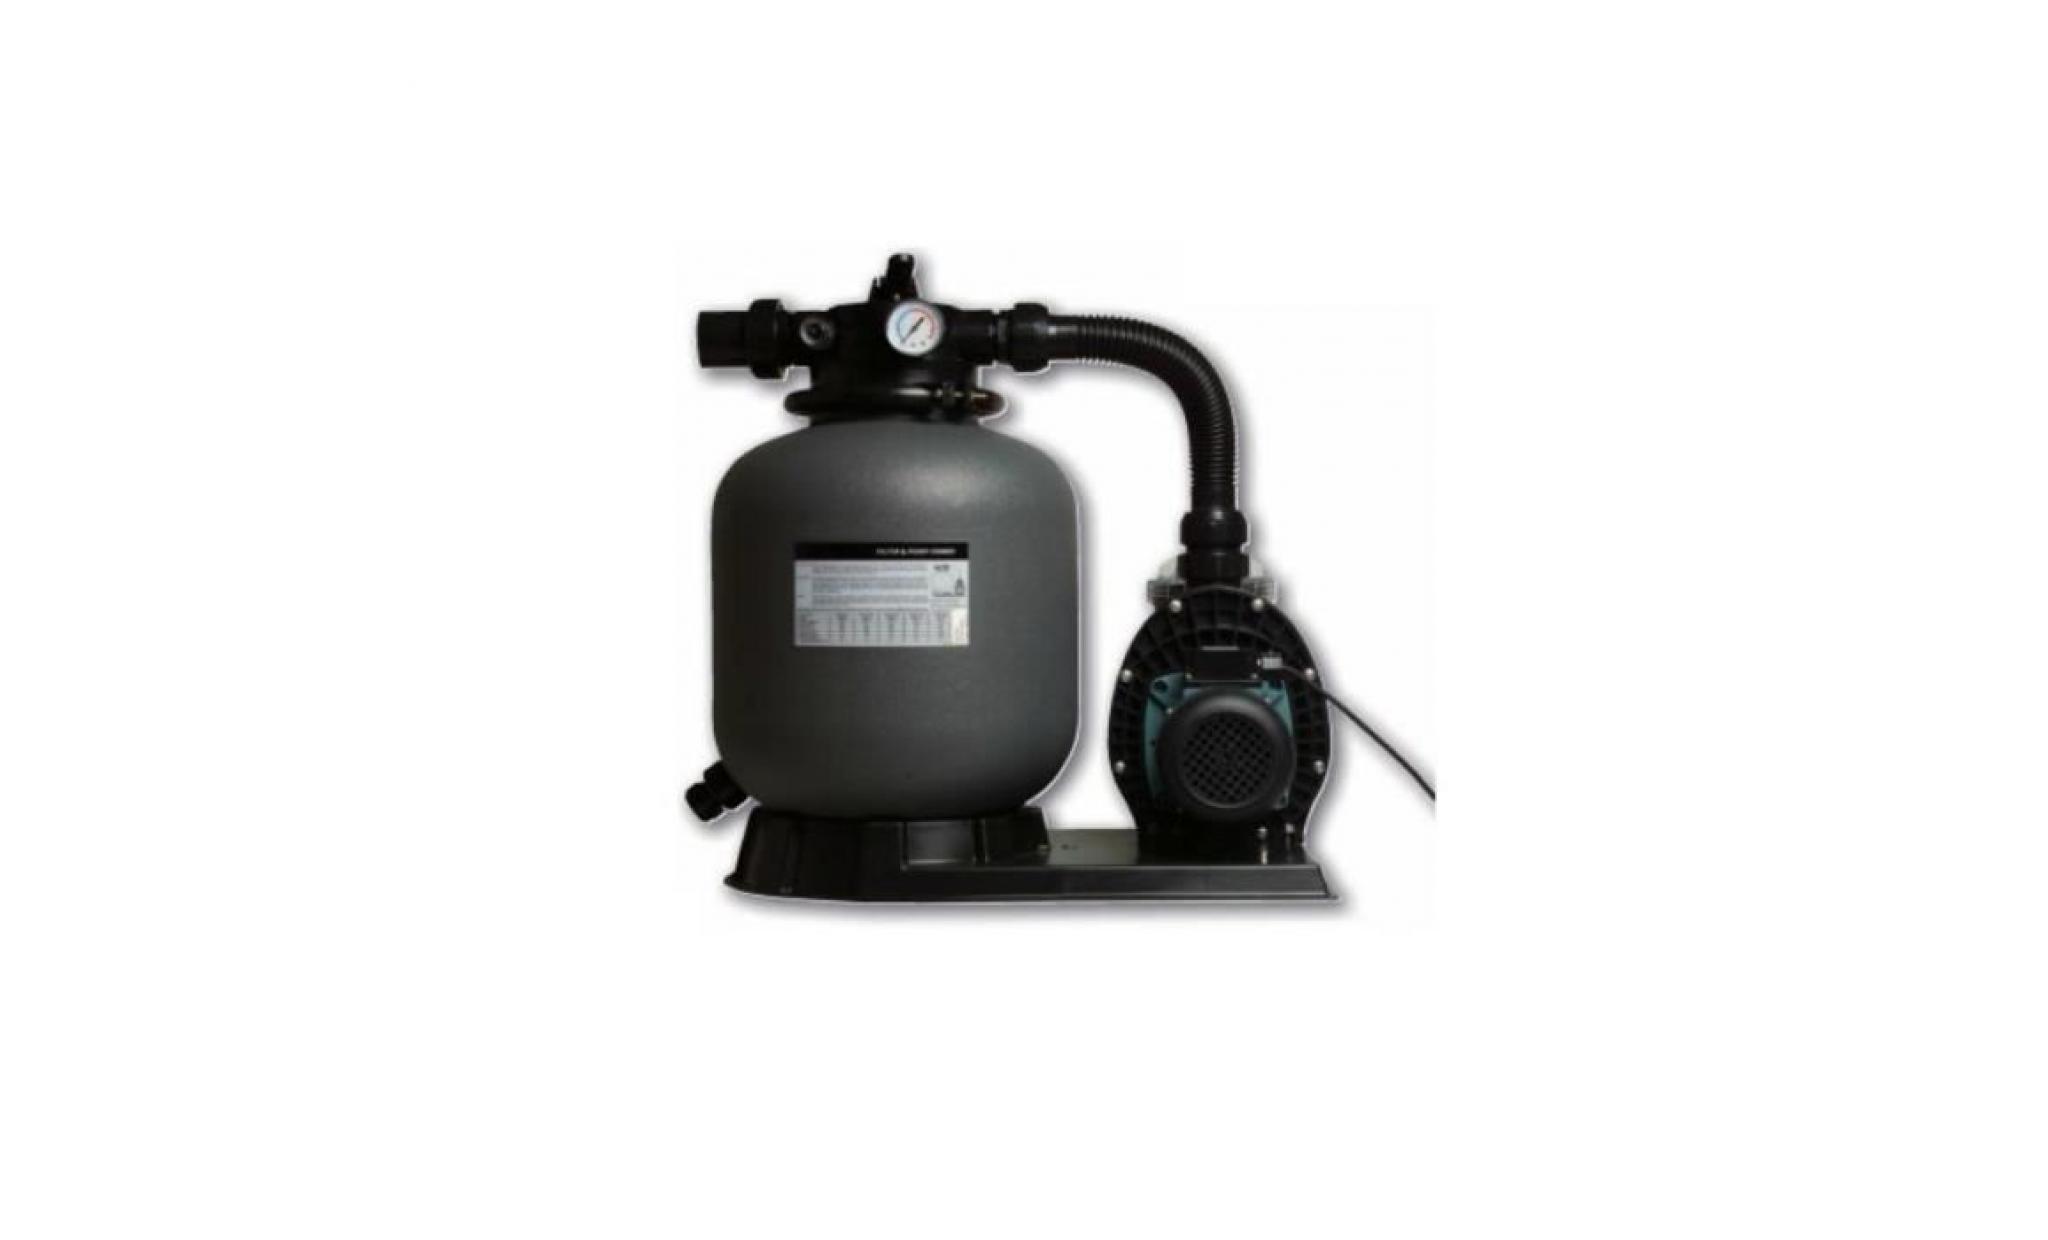 Filtration piscine hors sol hydro s filtre sable pompe 8 m3 h achat vente pompe piscine - Filtration sable piscine hors sol ...